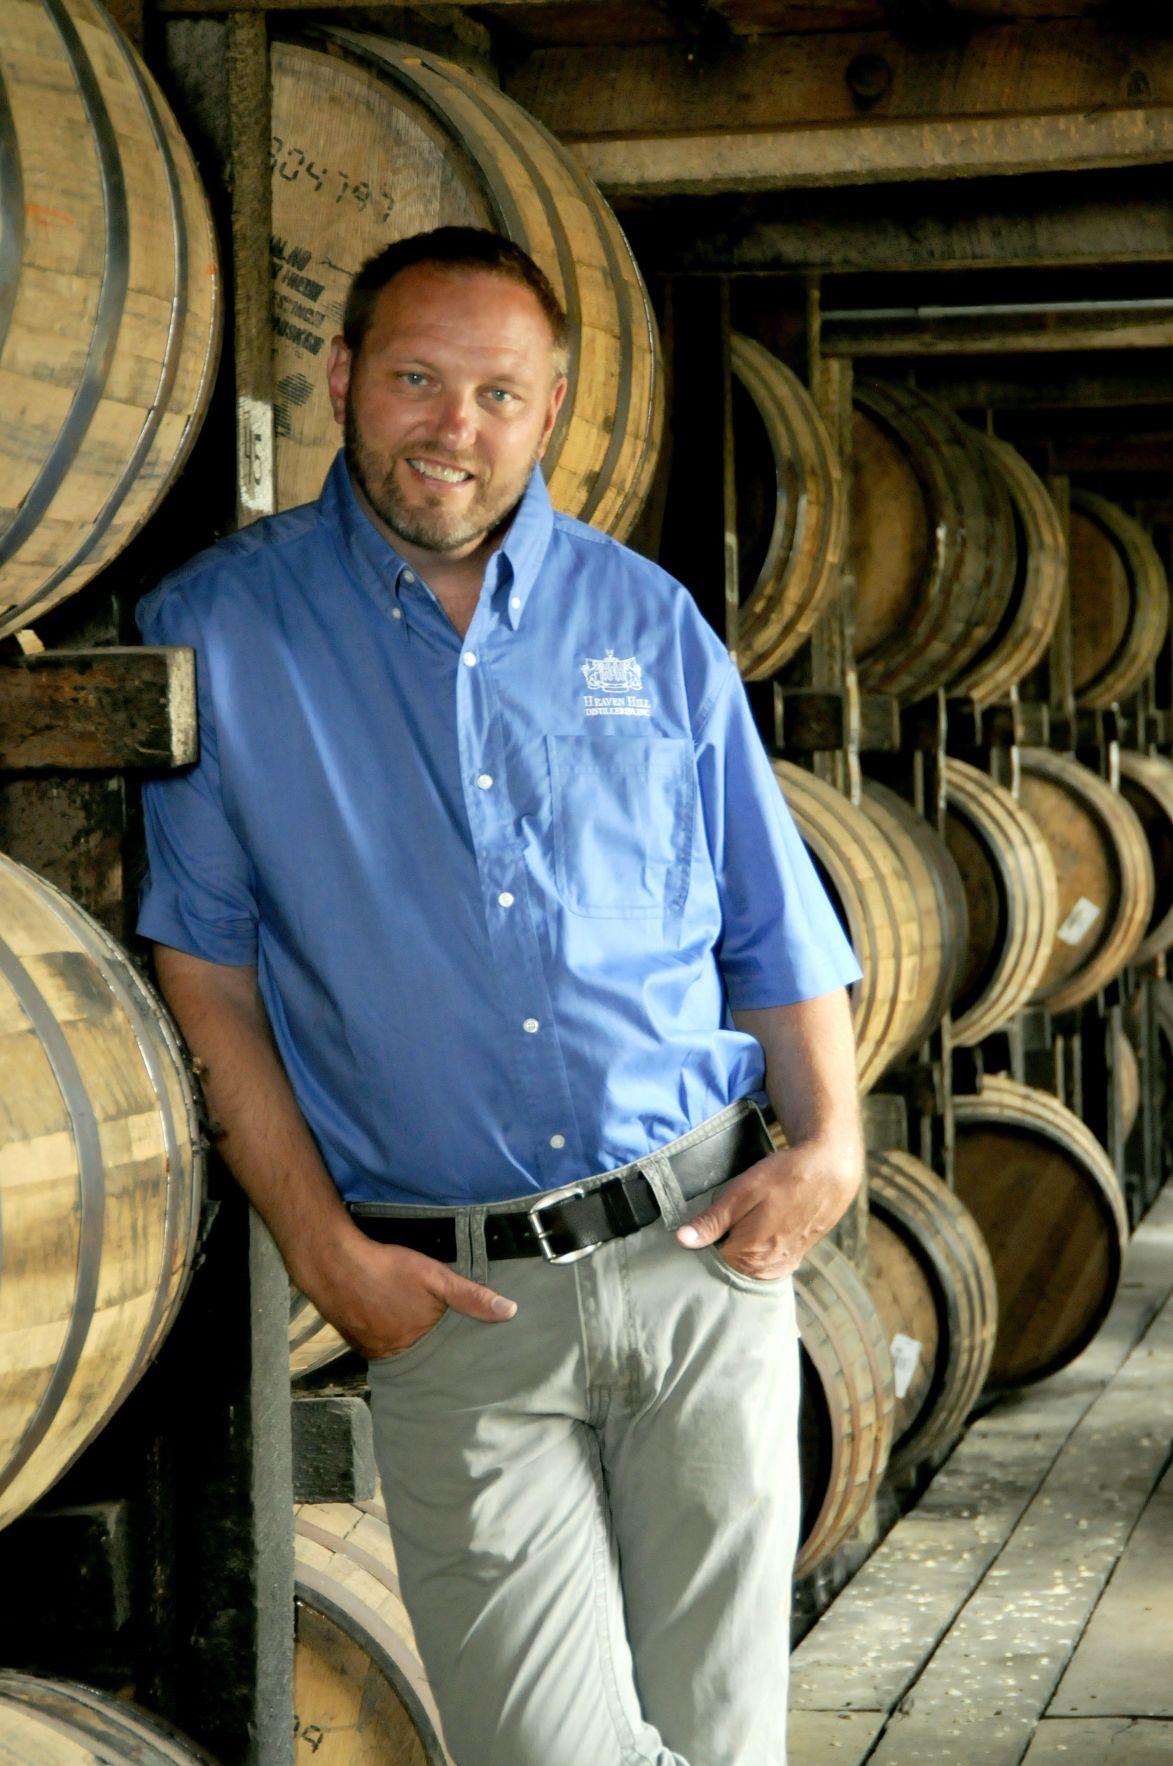 How Bluegrass distillers saved bourbon: Bernie Lubbers' sung history